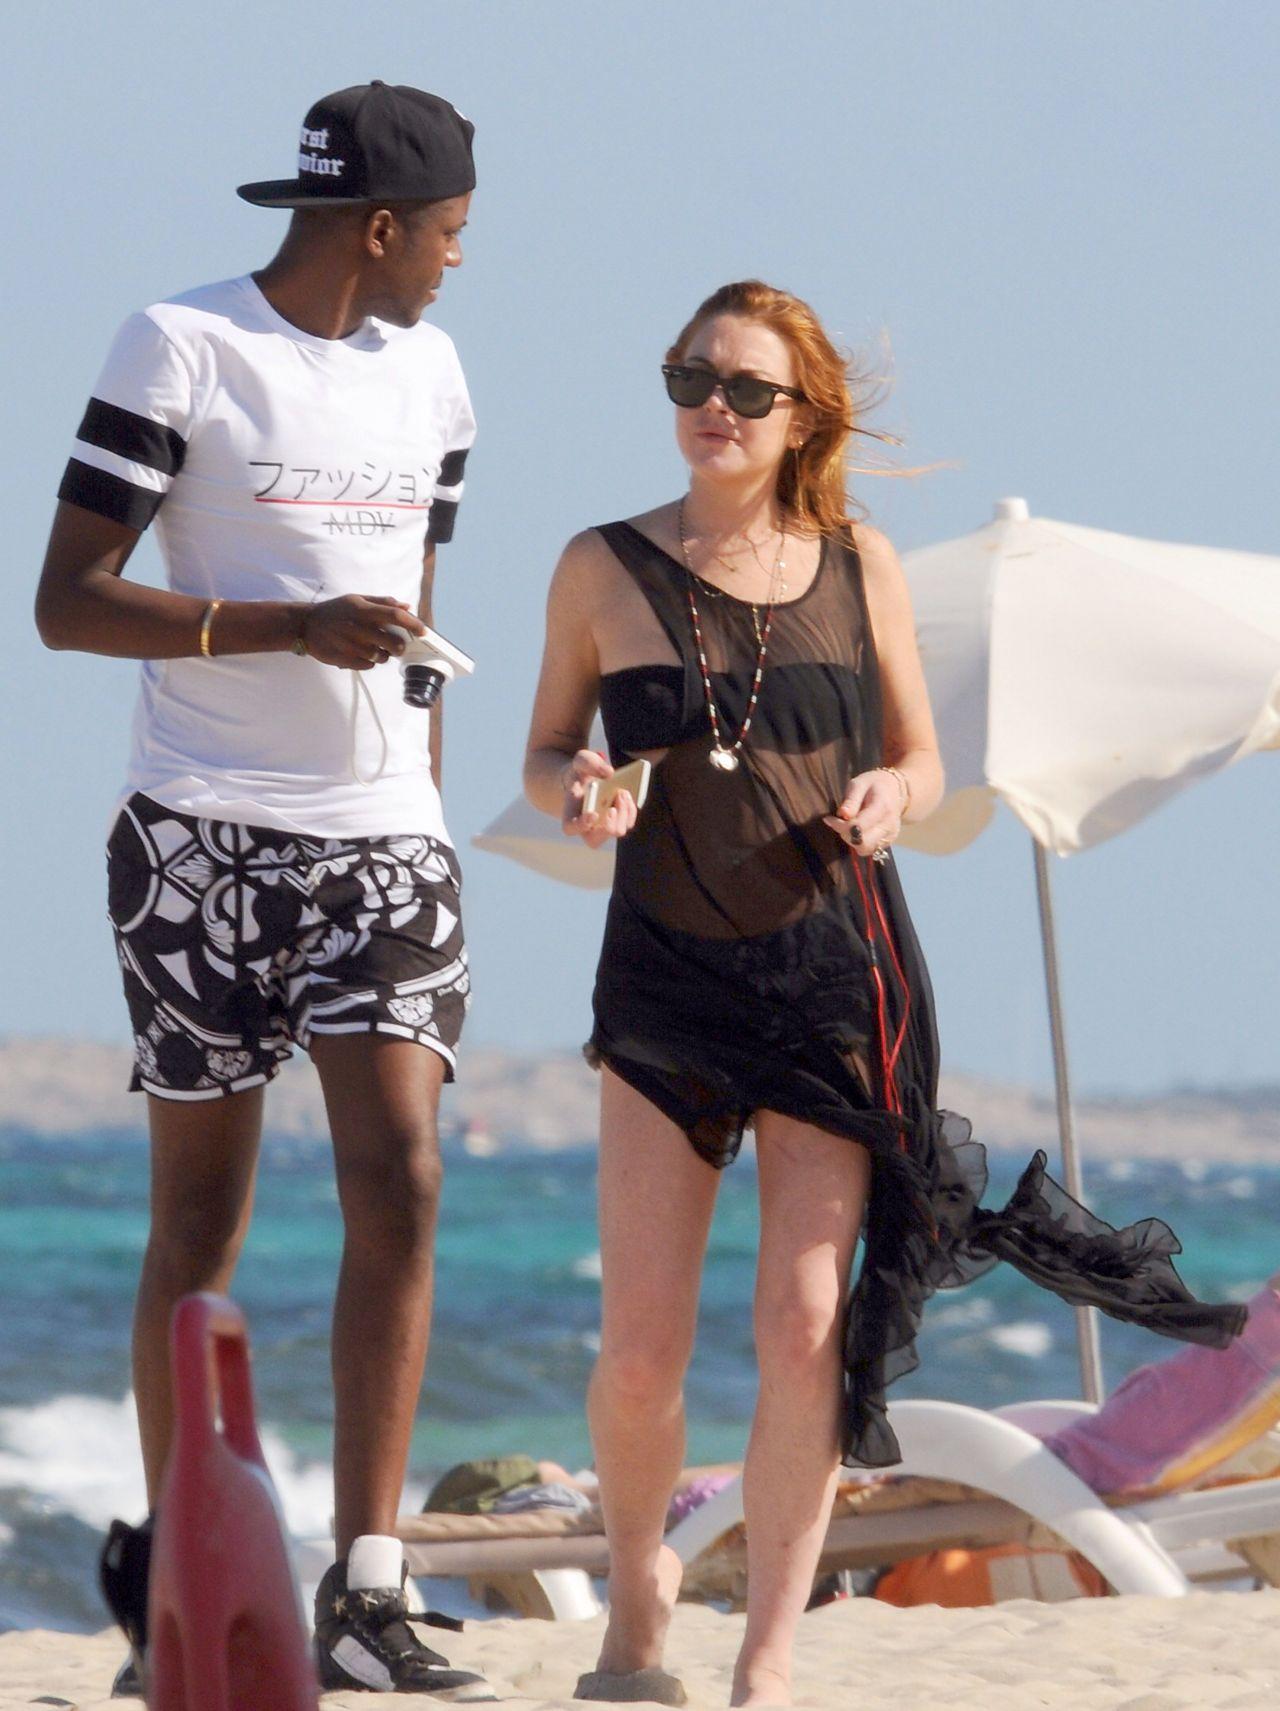 Lindsay Lohan on a Beach in Ibizza - July 2014